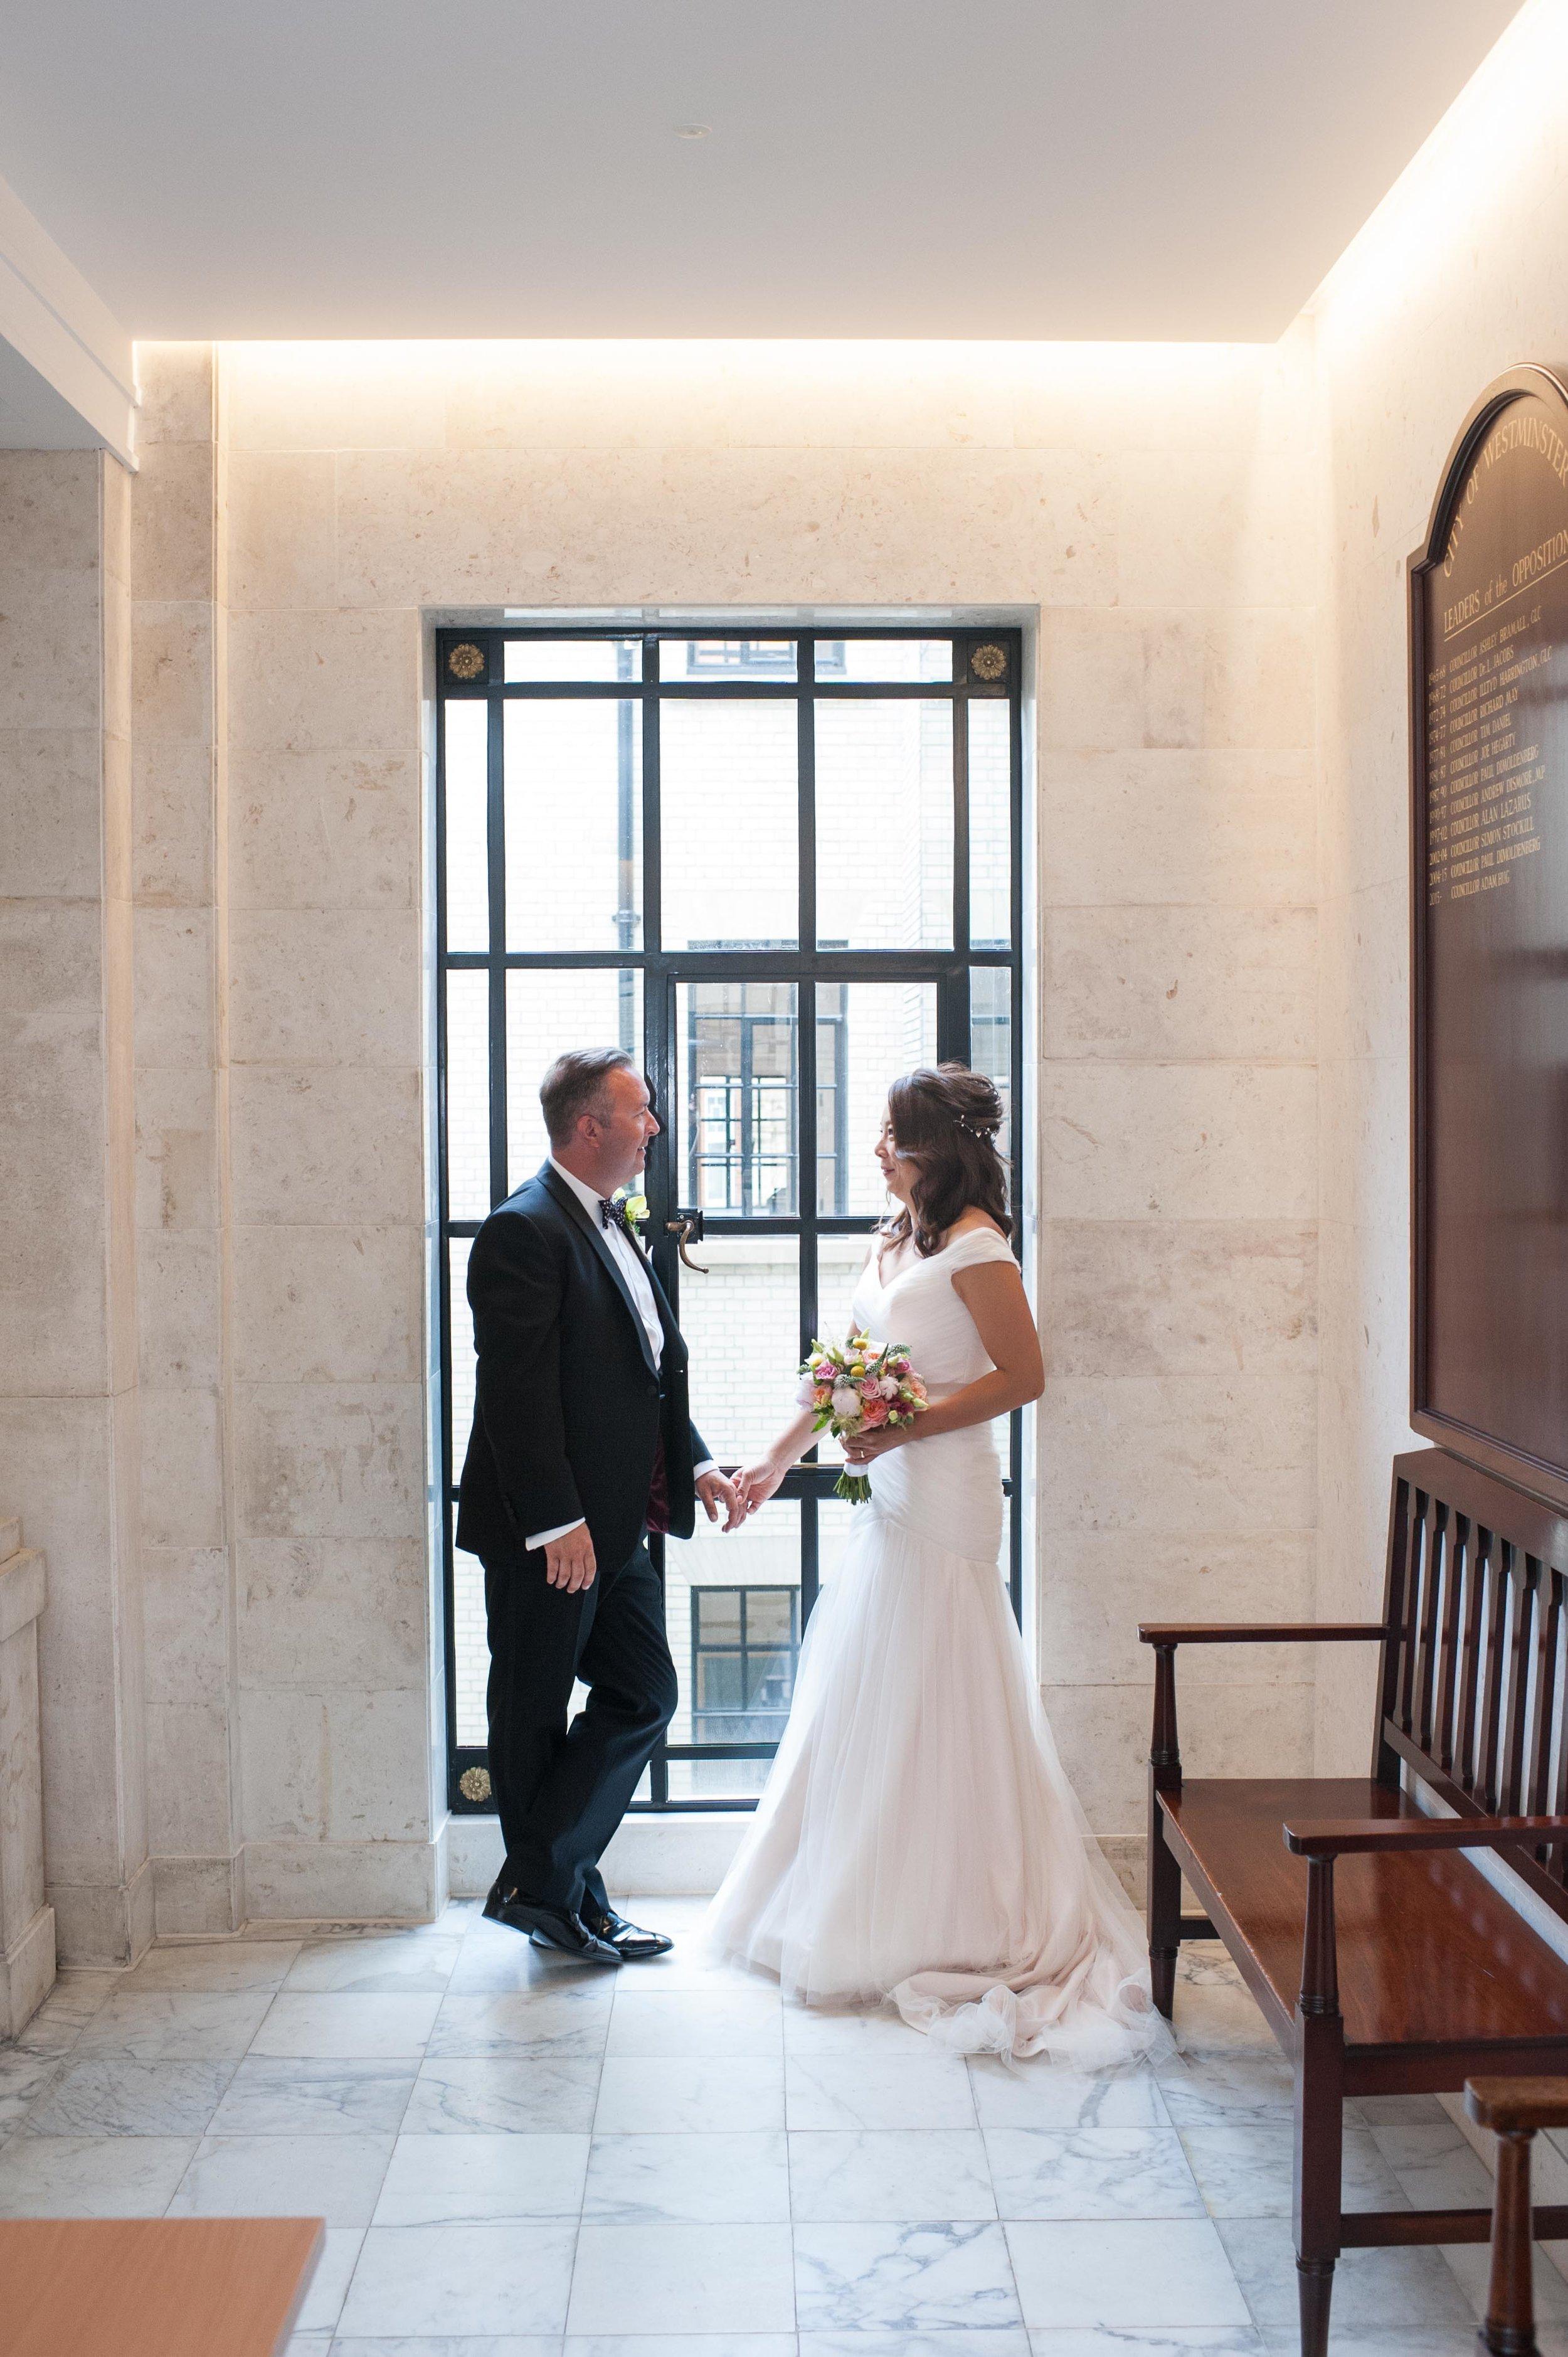 D&M_Marylebone Town Hall Wedding (119 of 239).jpg